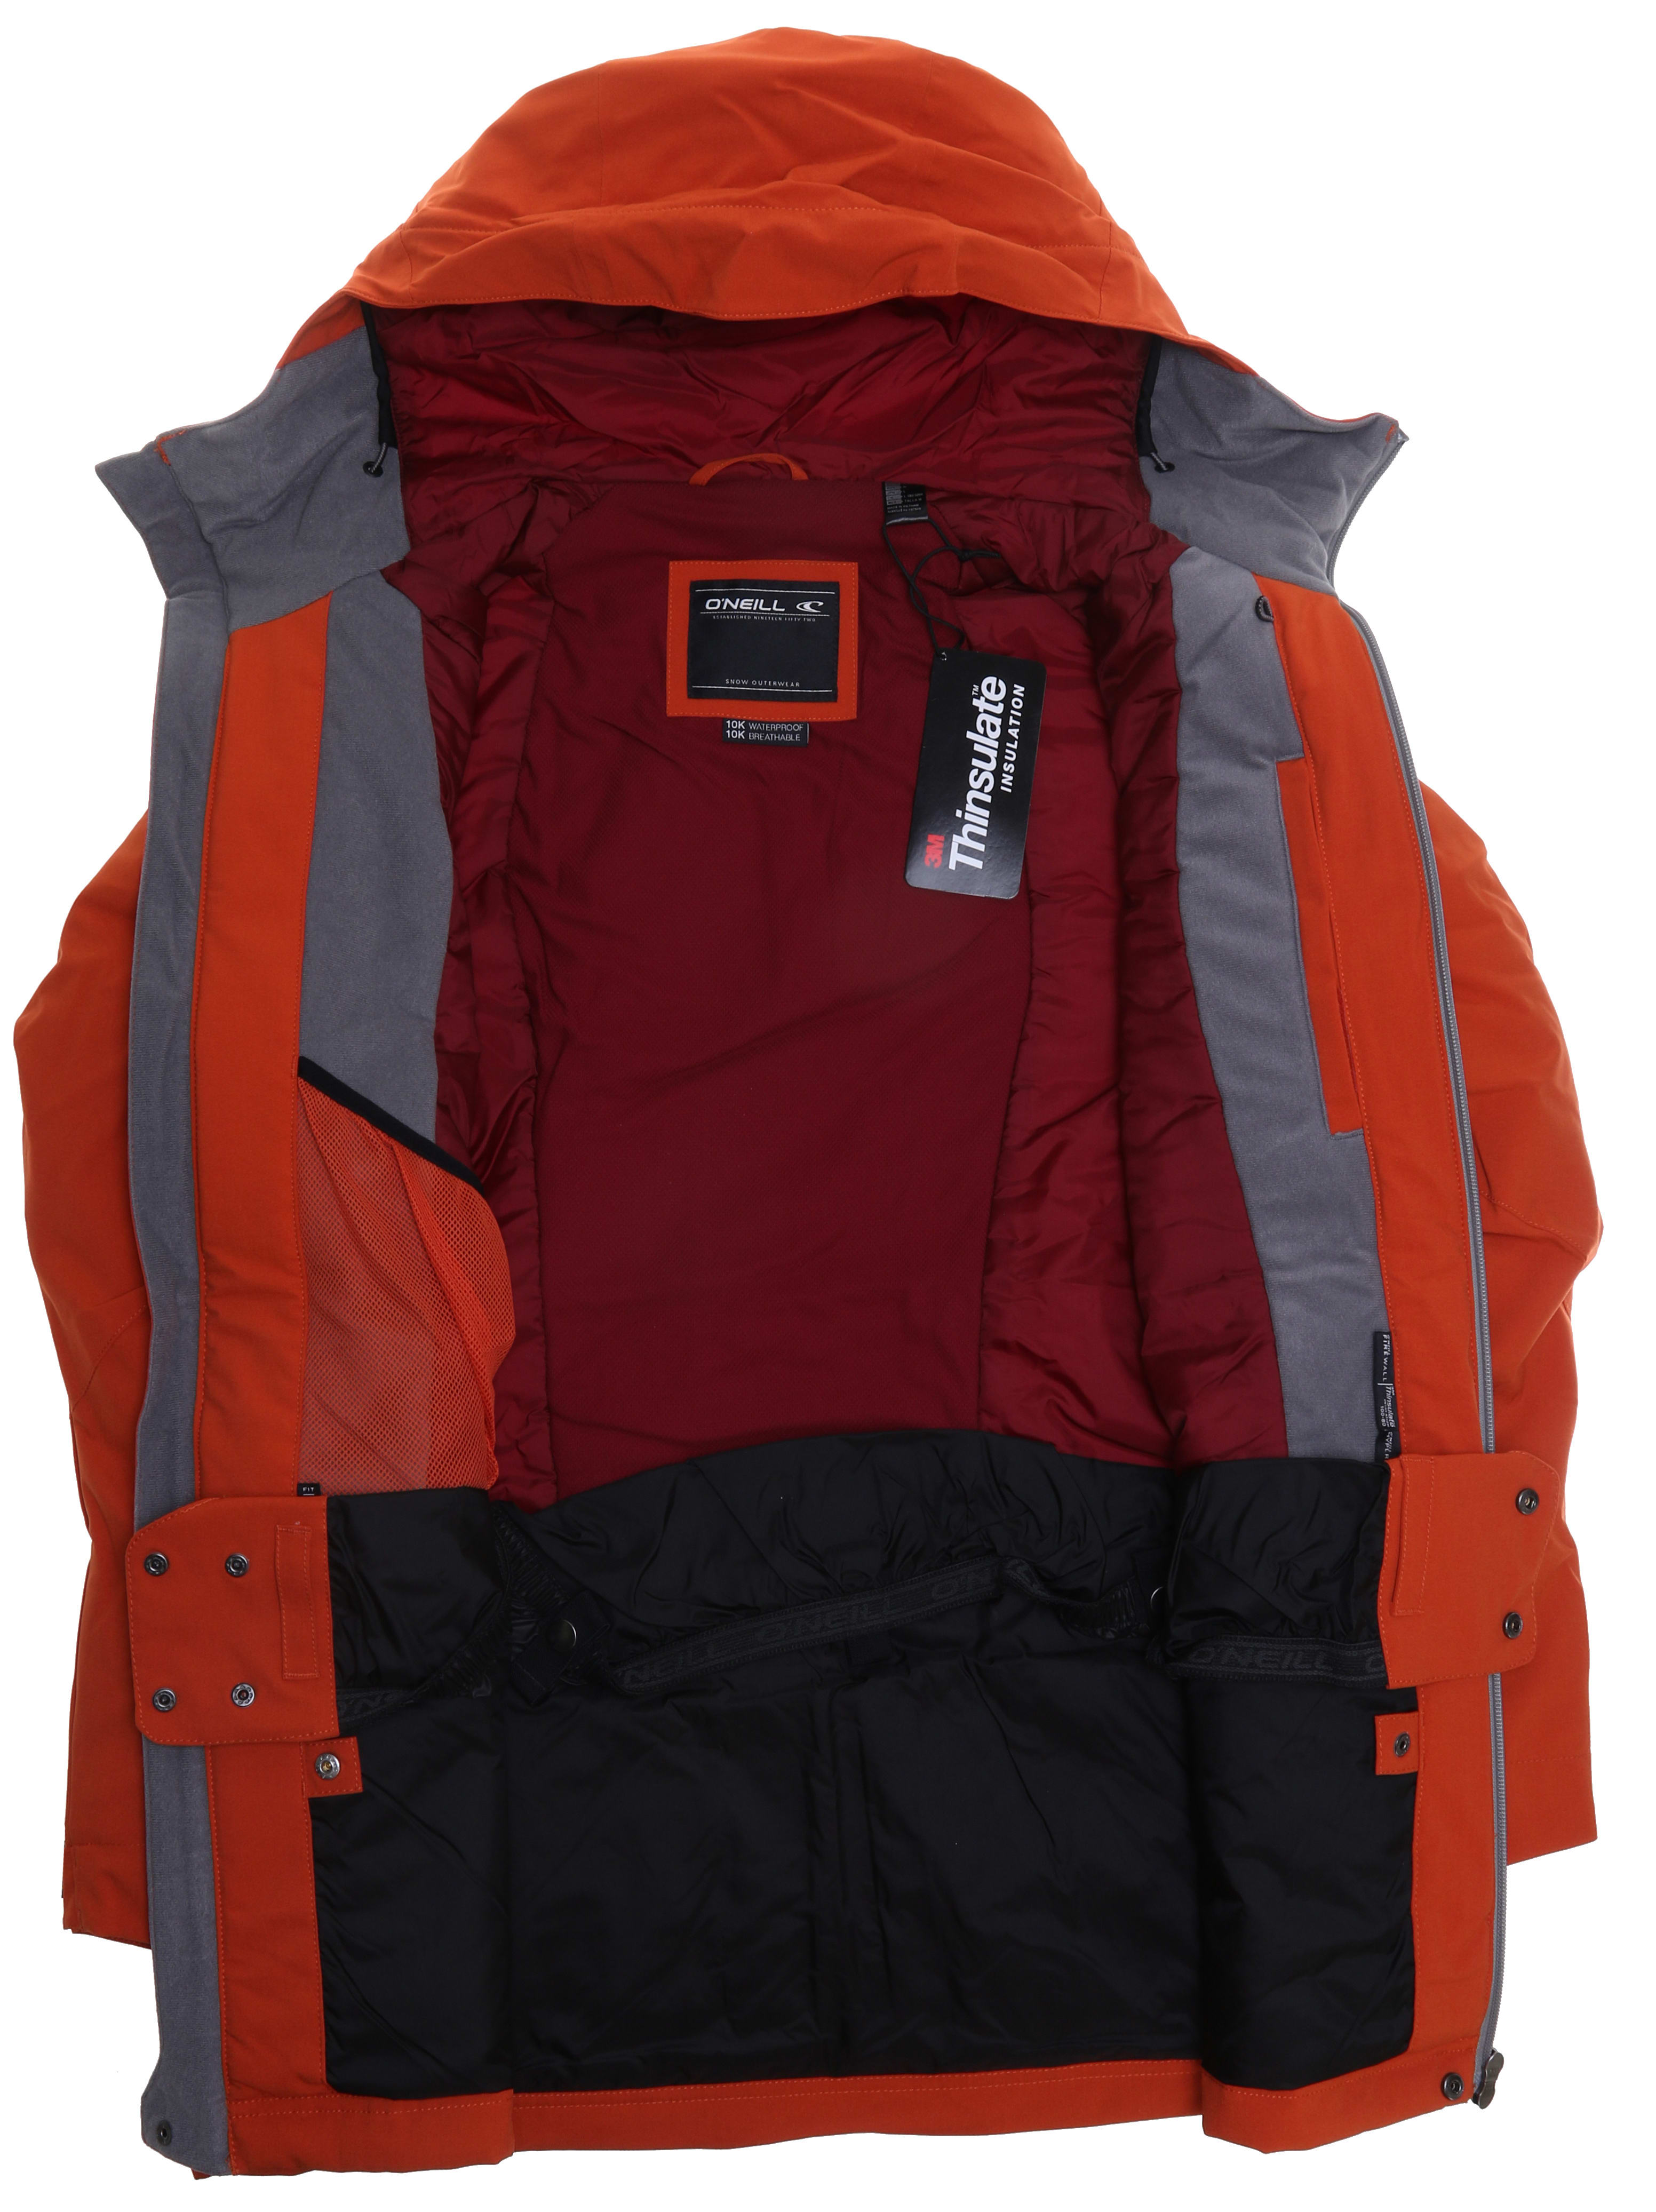 ONeill Heat II Snowboard Jacket - thumbnail 3